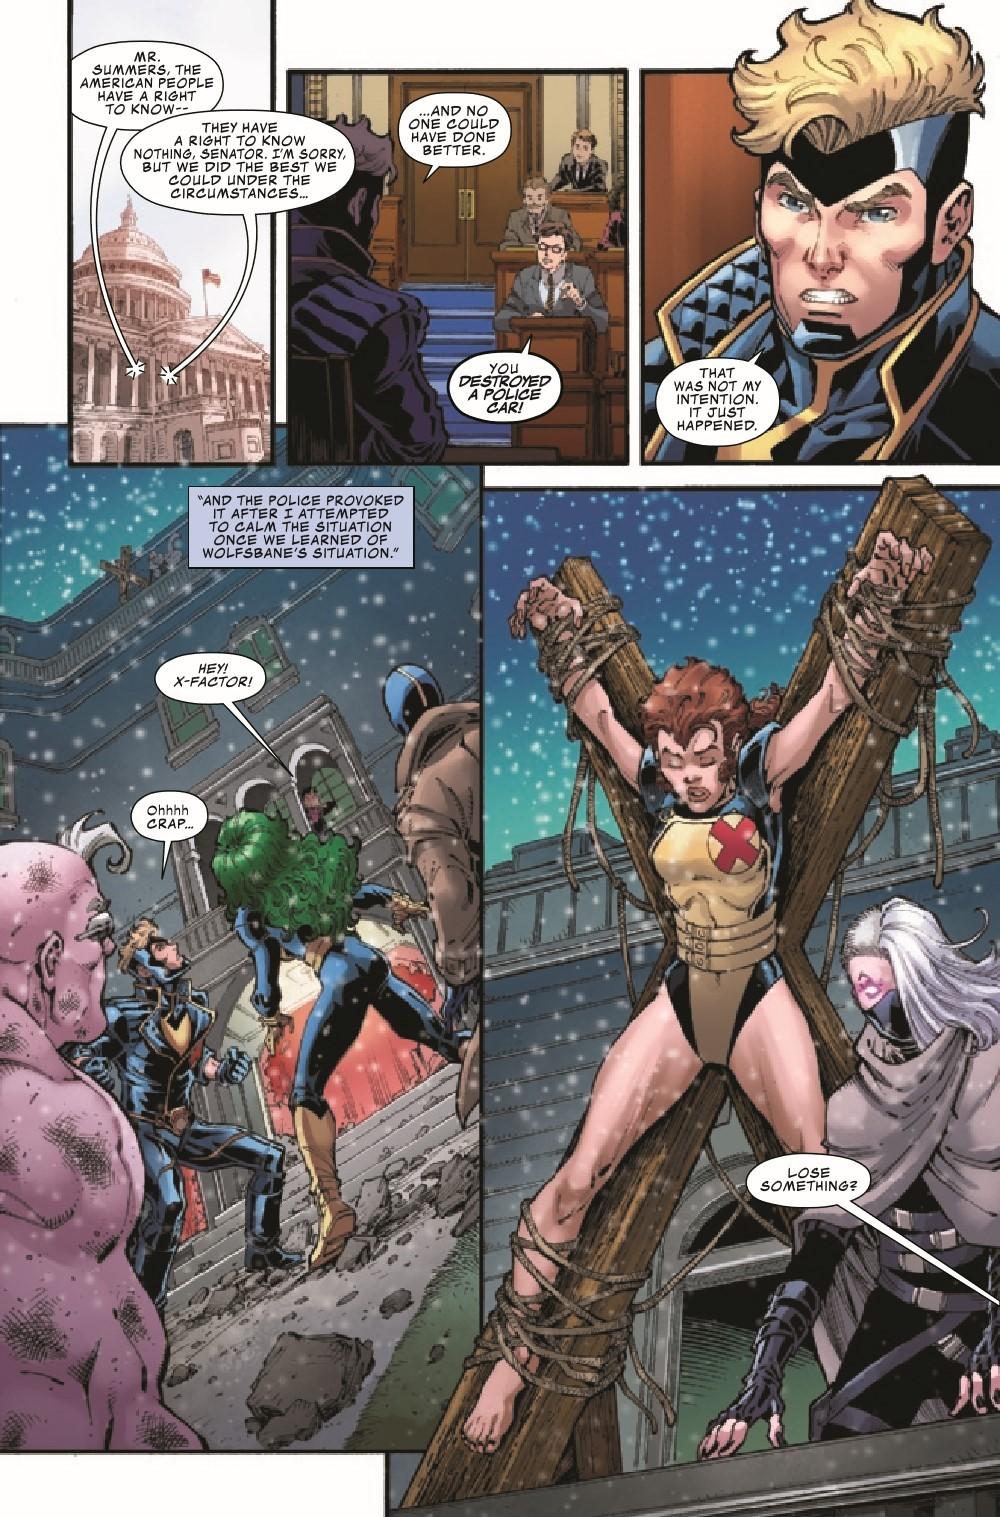 XMLEGENDS2021006_Preview-3 ComicList Previews: X-MEN LEGENDS #6